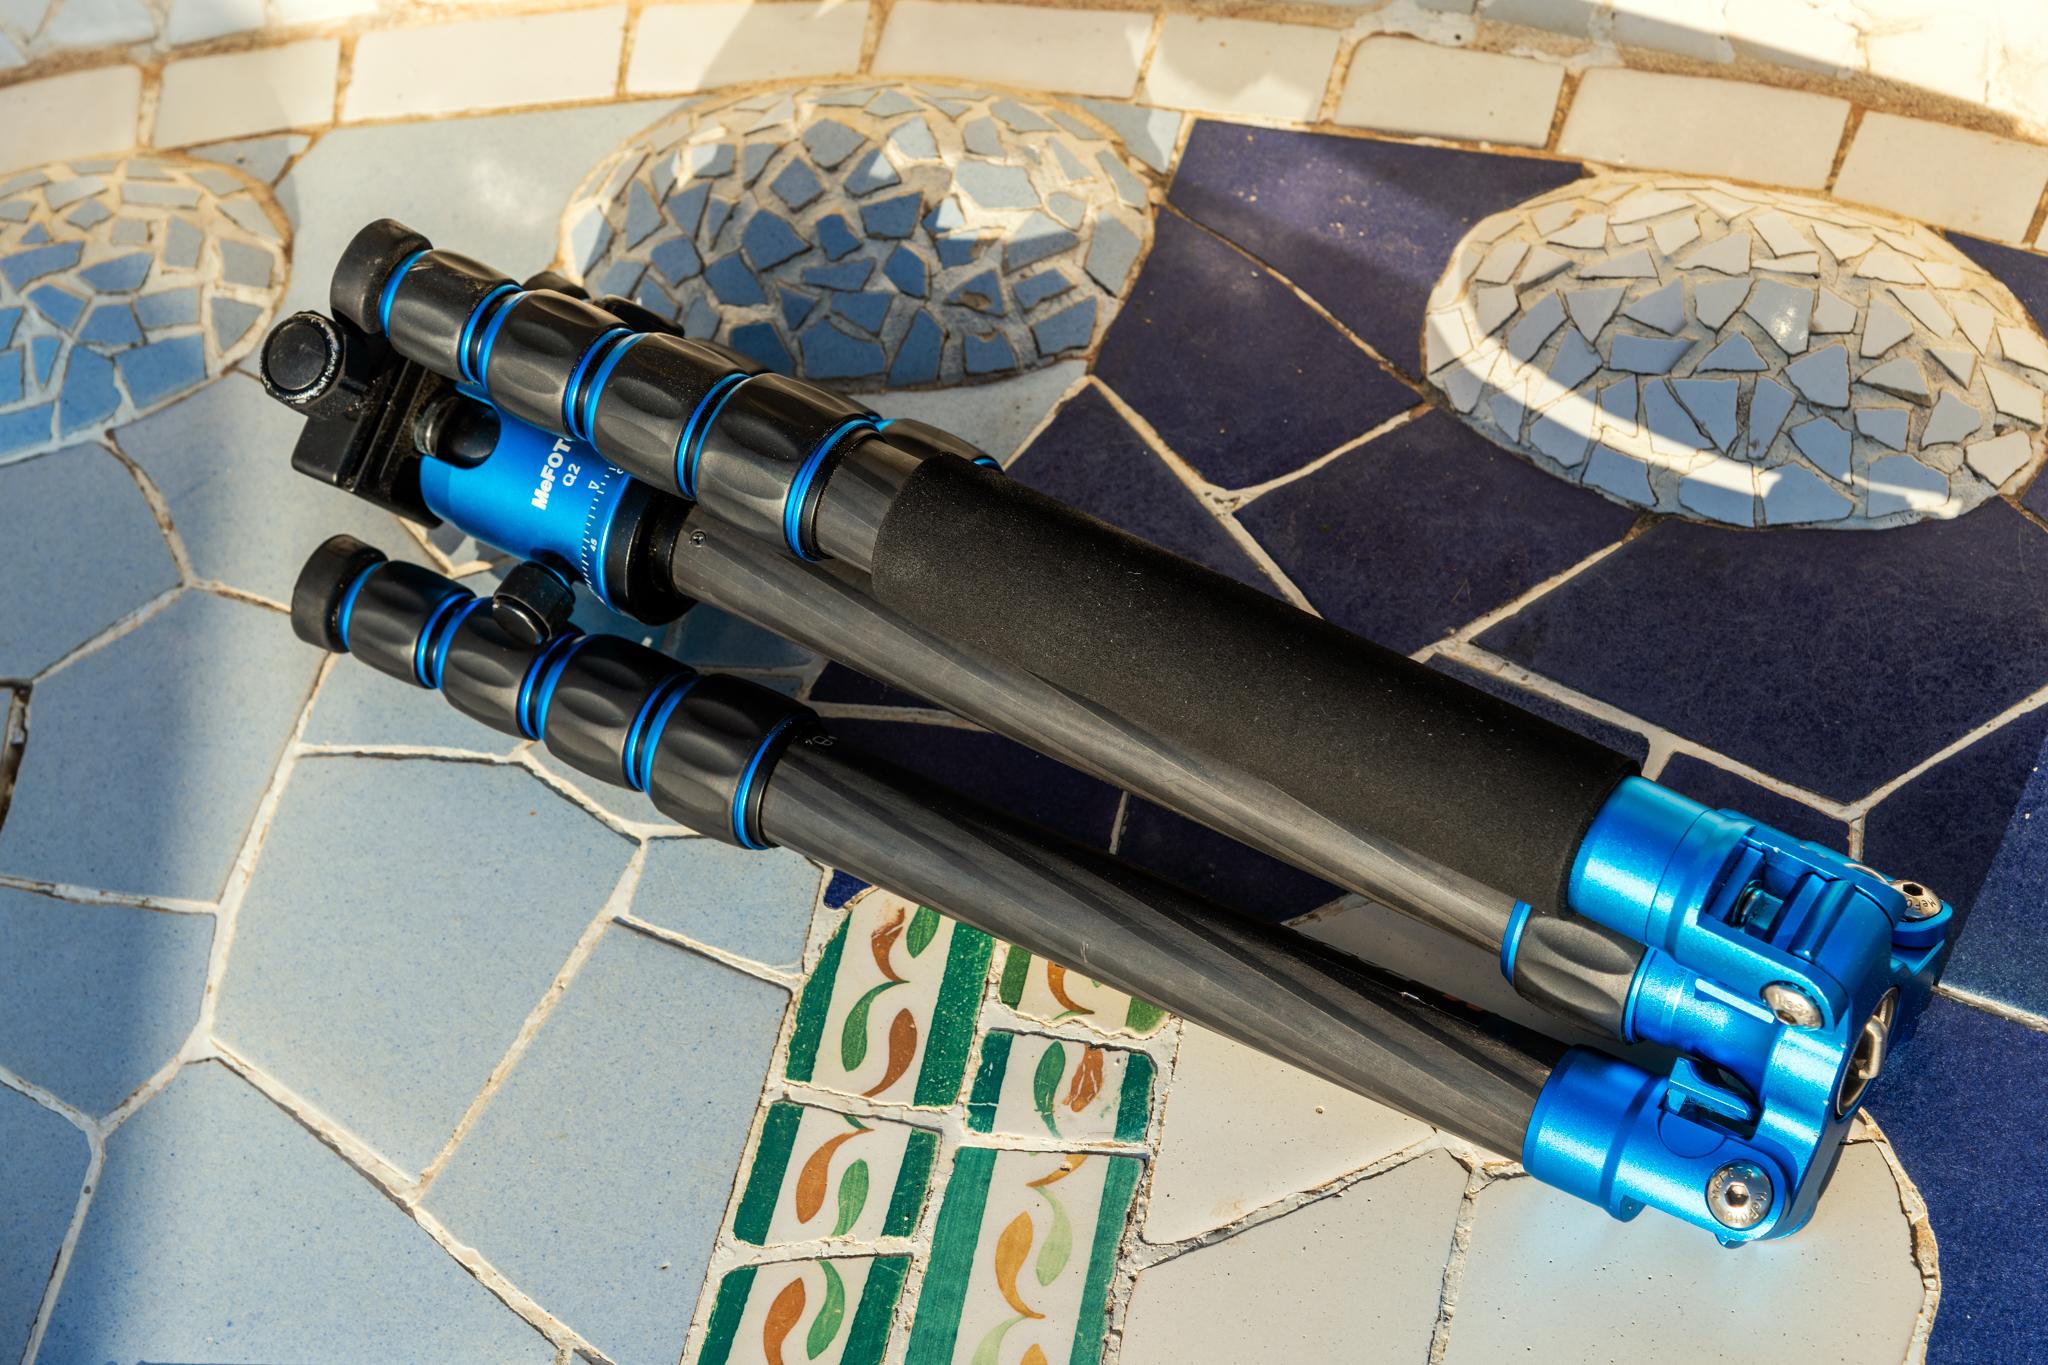 My reviews: MeFoto GlobeTrotter carbon fiber tripod